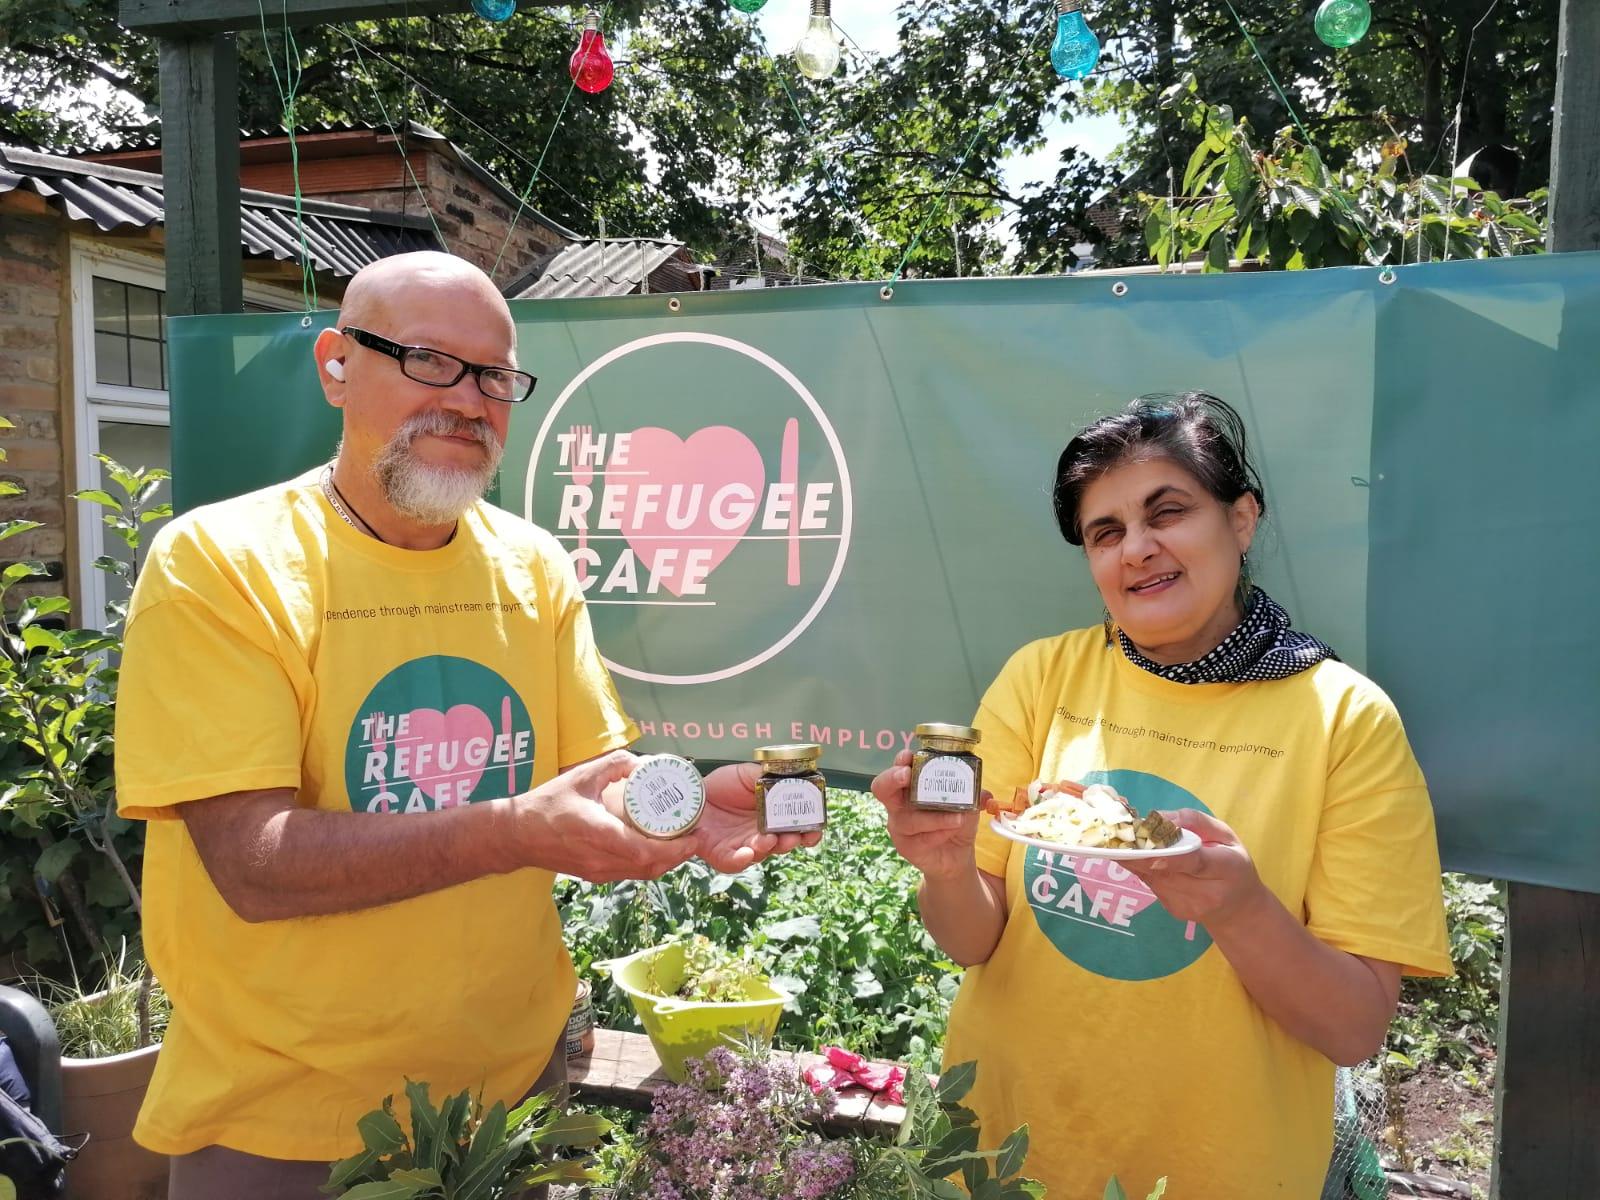 Iolanda Chirico and Marco Munoz showcasing some of the Refugee Cafe's pilot products. Taken by: Sujeewa Samasundara